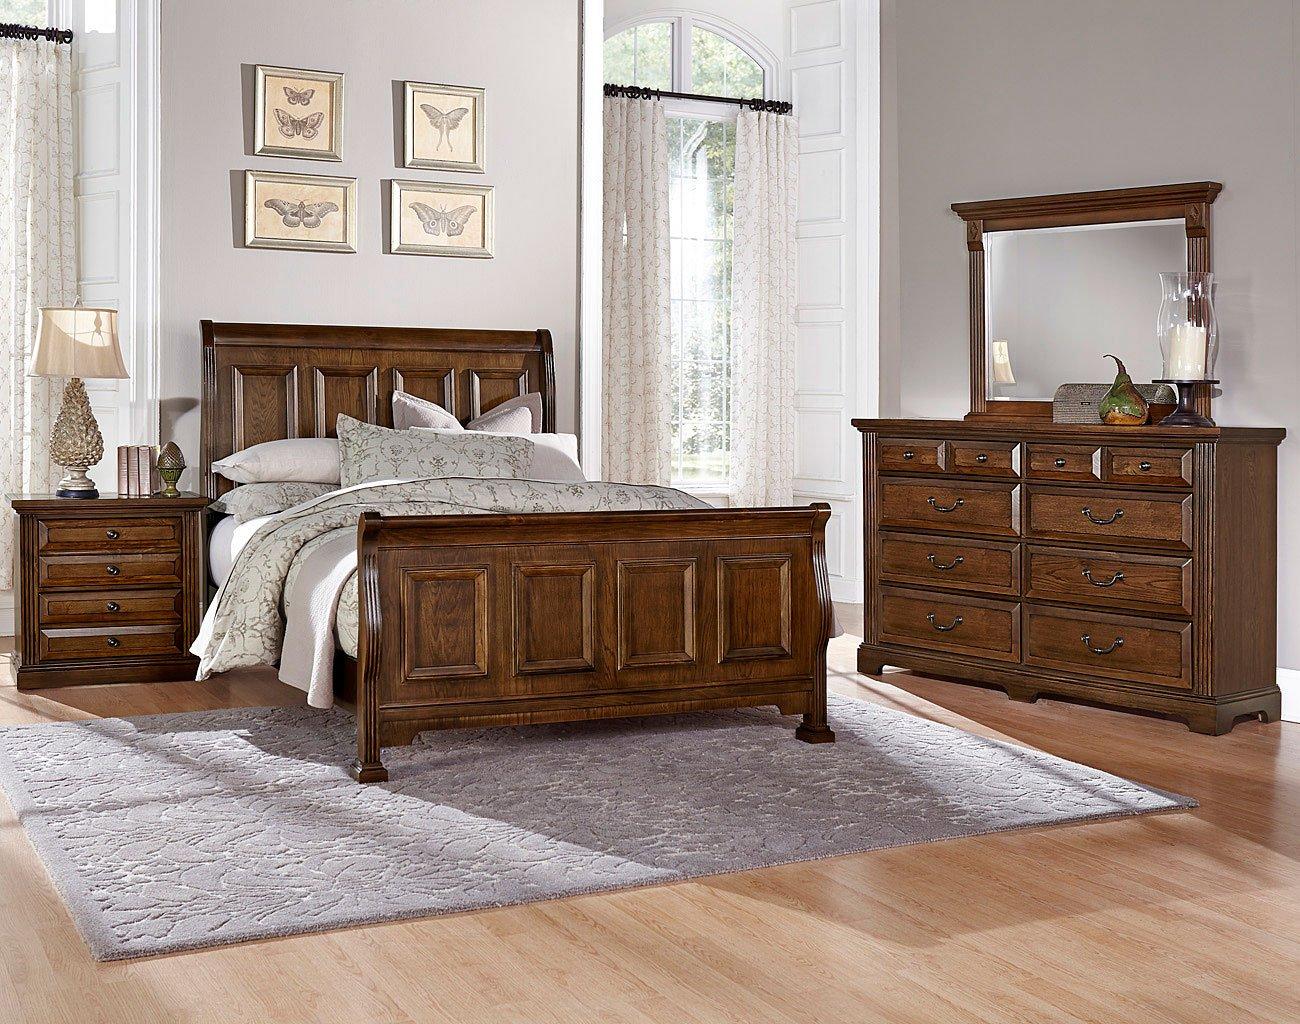 Woodlands Sleigh Bedroom Set (Oak)